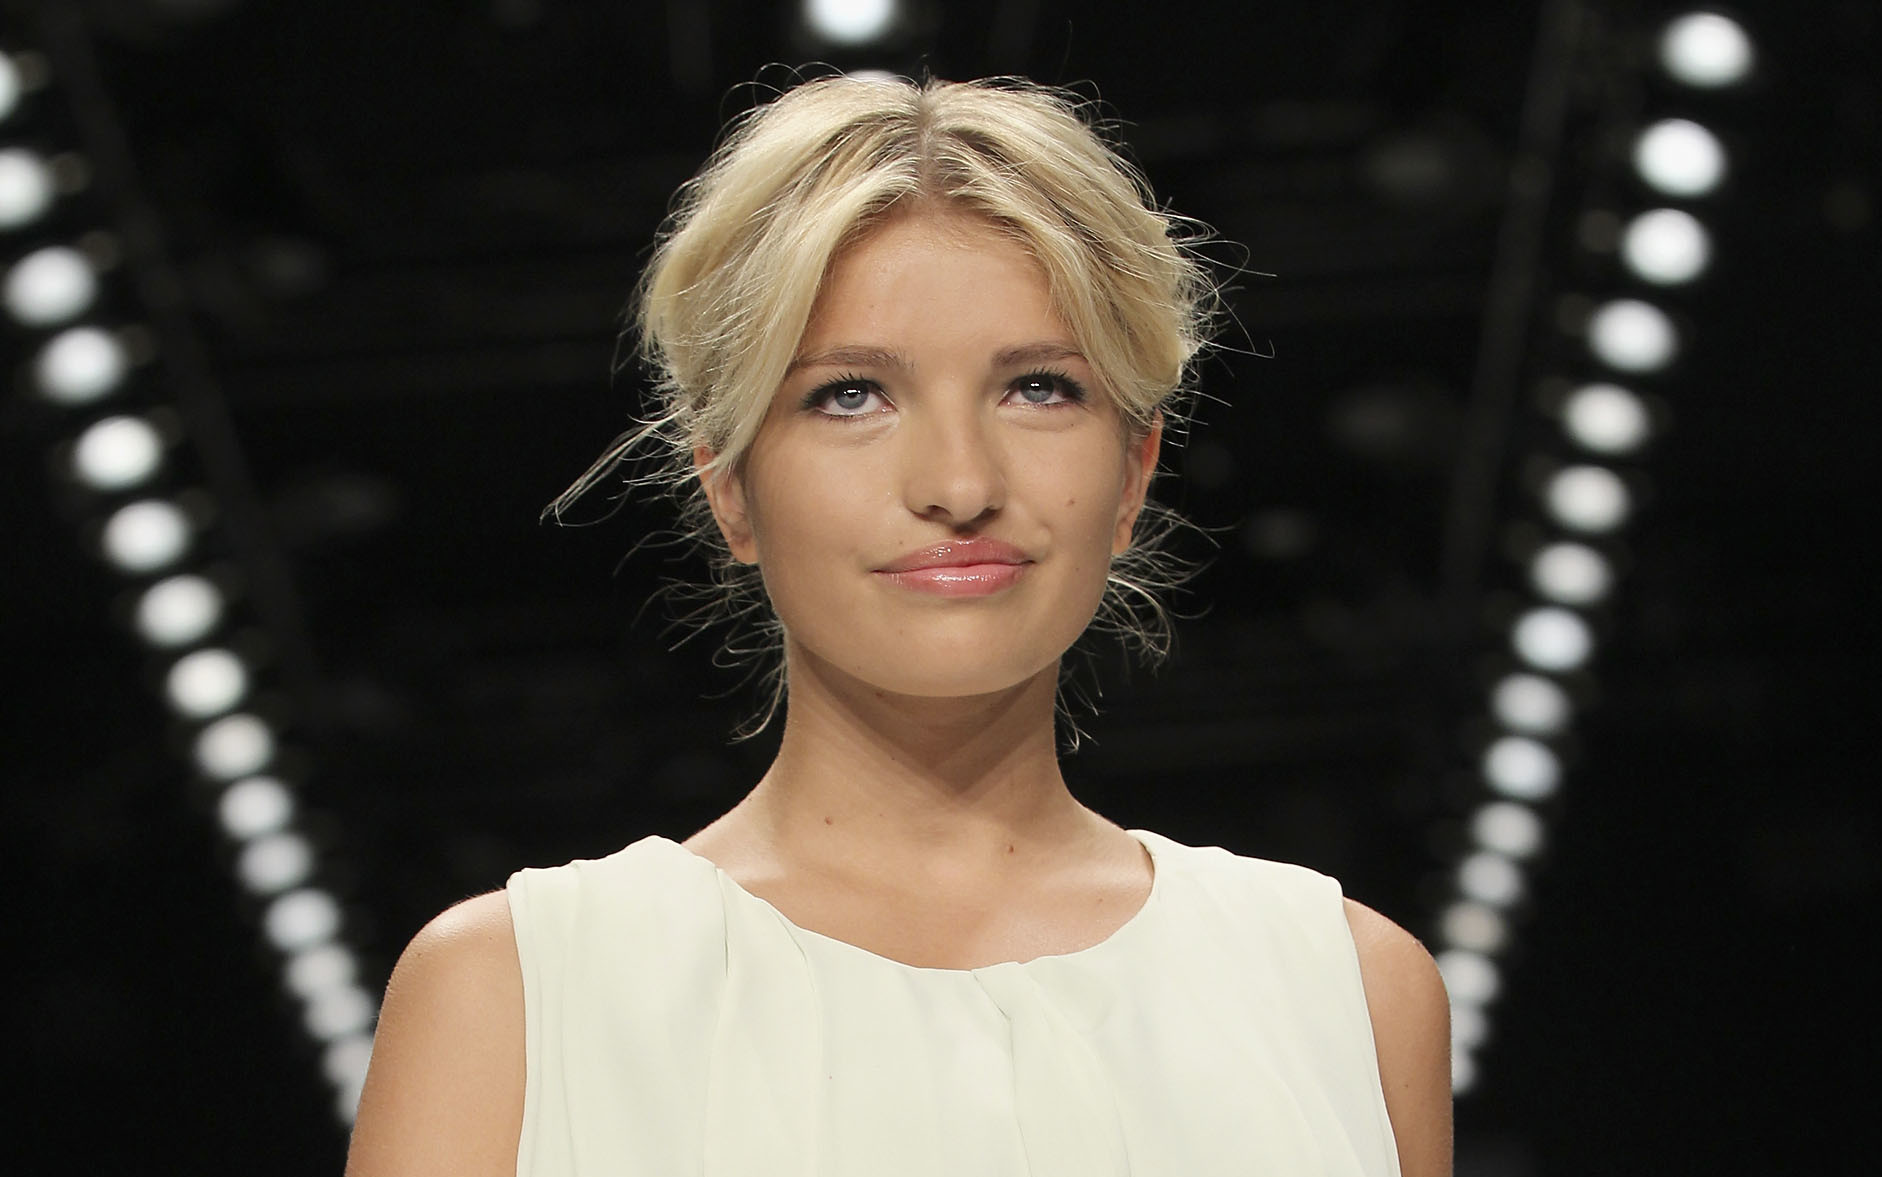 1e8a9f235 Sarina Nowak ist jetzt Plus-Size-Model